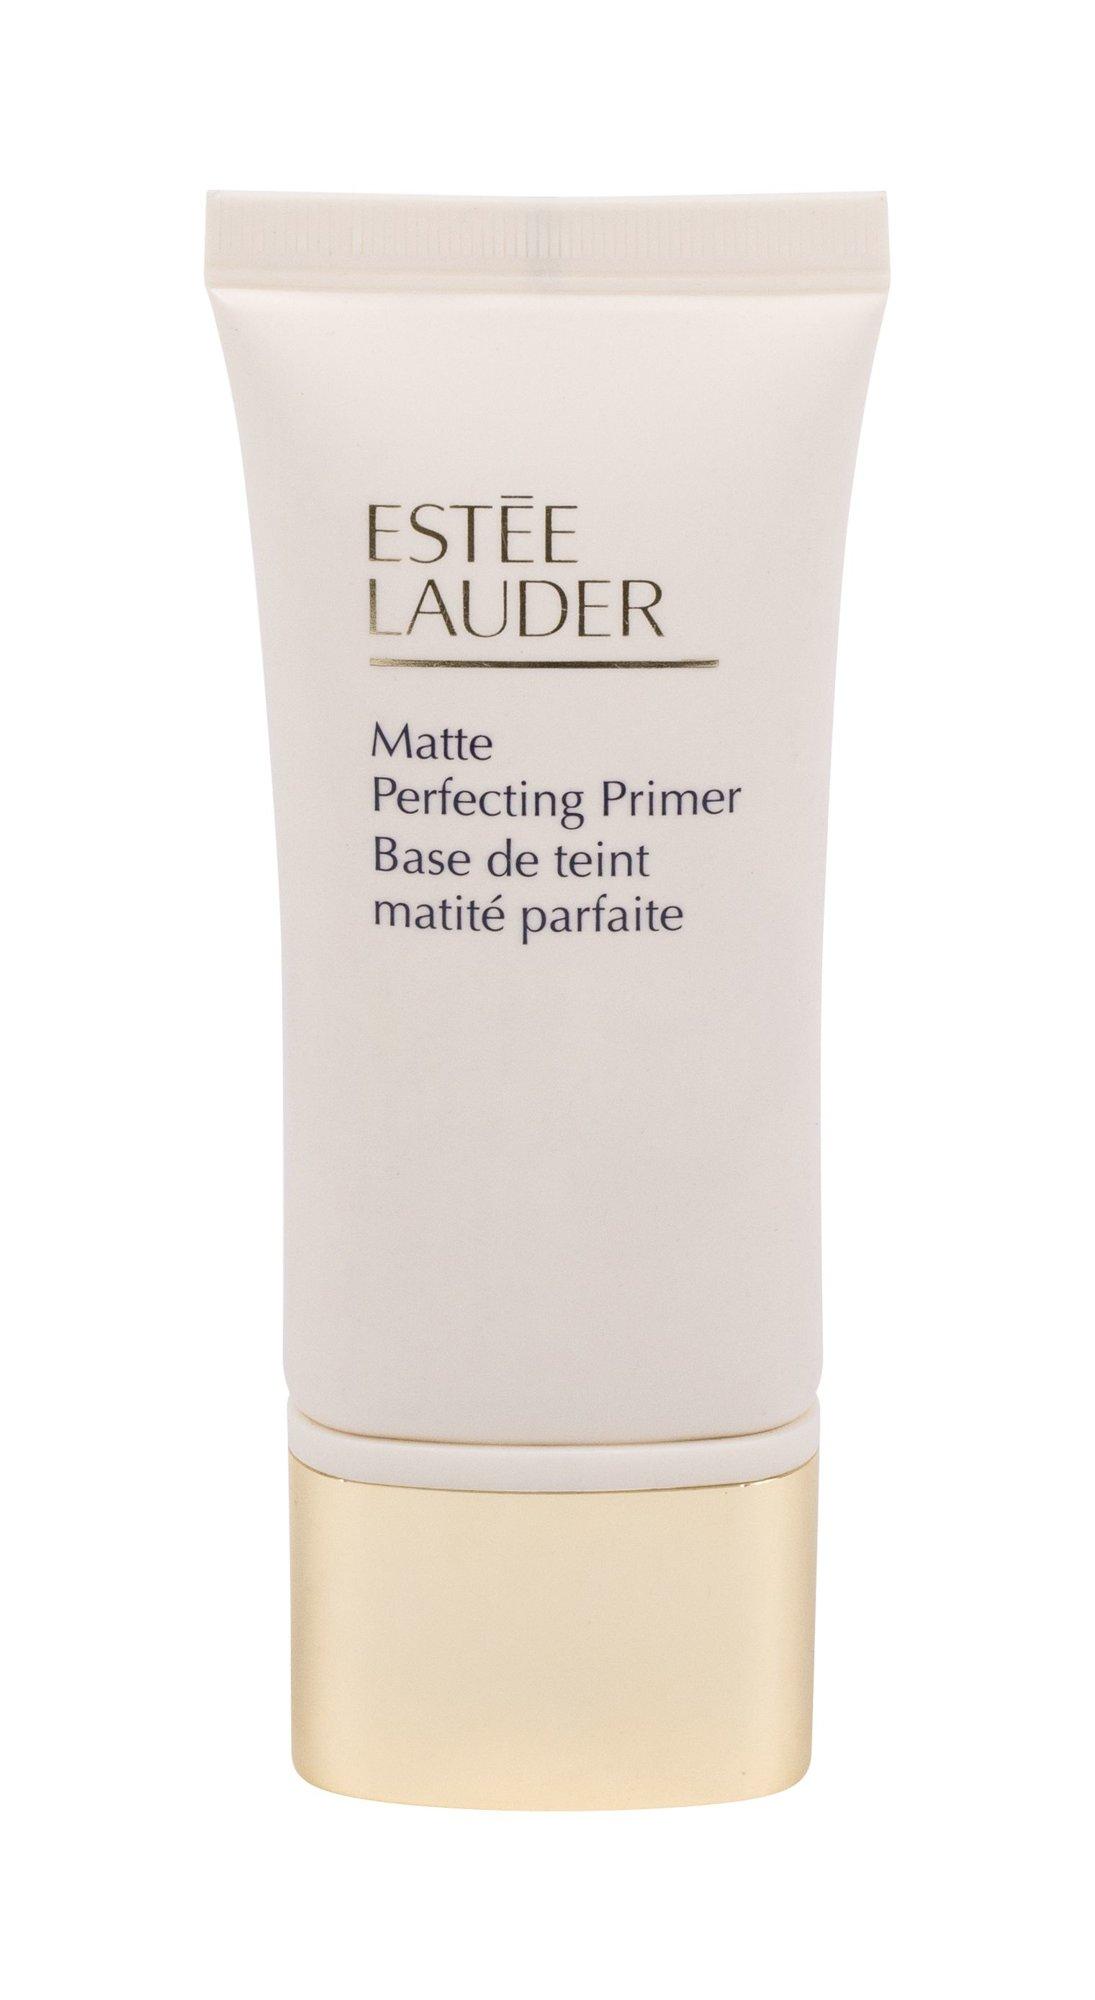 Estée Lauder Matte Perfecting Primer Makeup Primer 30ml